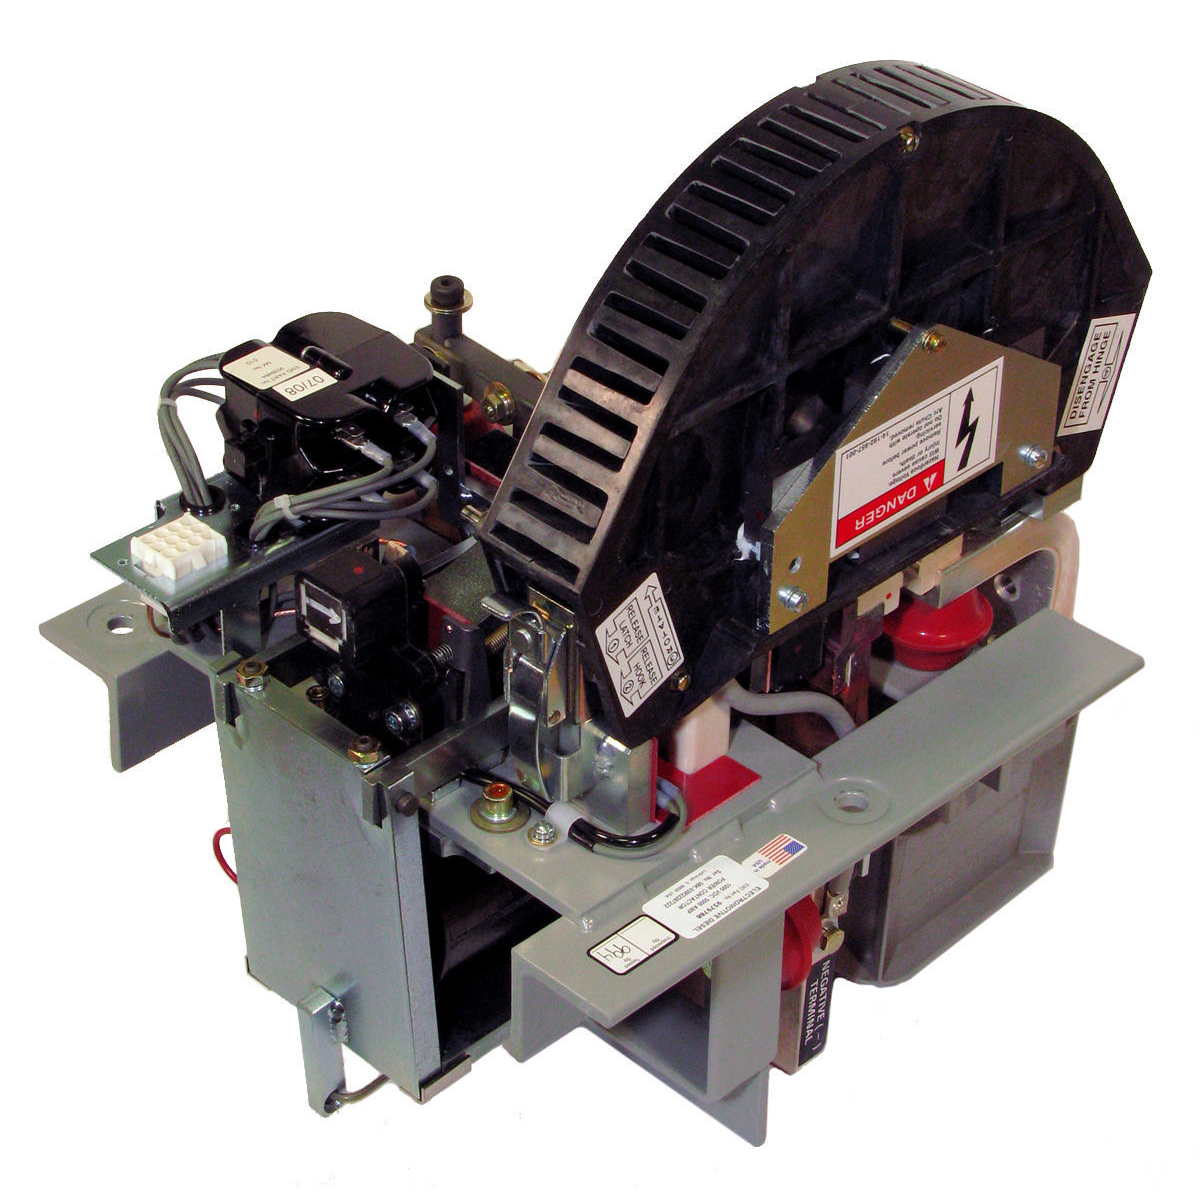 hc14193701582 dc contactors contactors industrial controlshc14193701582 by hubbell industrial controls